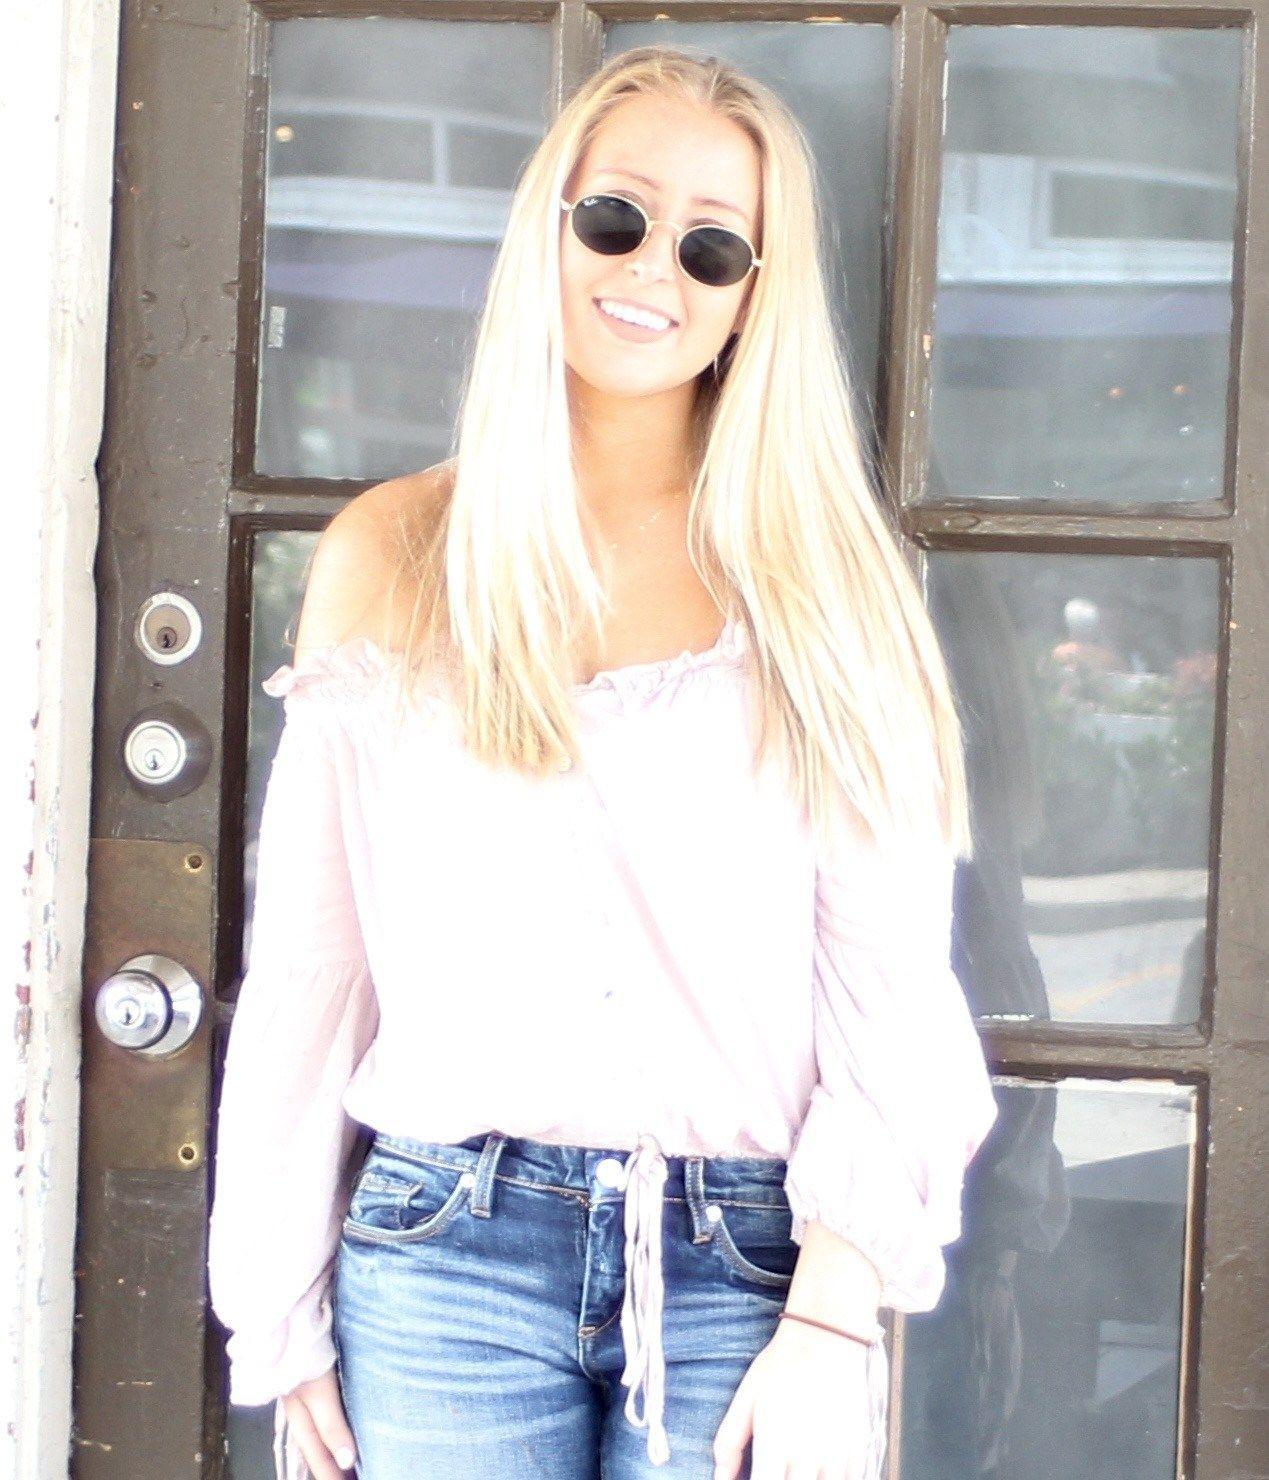 Ϸƽ̨ ˶ Ǯ Ϸƽ̨ ߡ Blue shirt with jeans, Purple shirt, Fashion